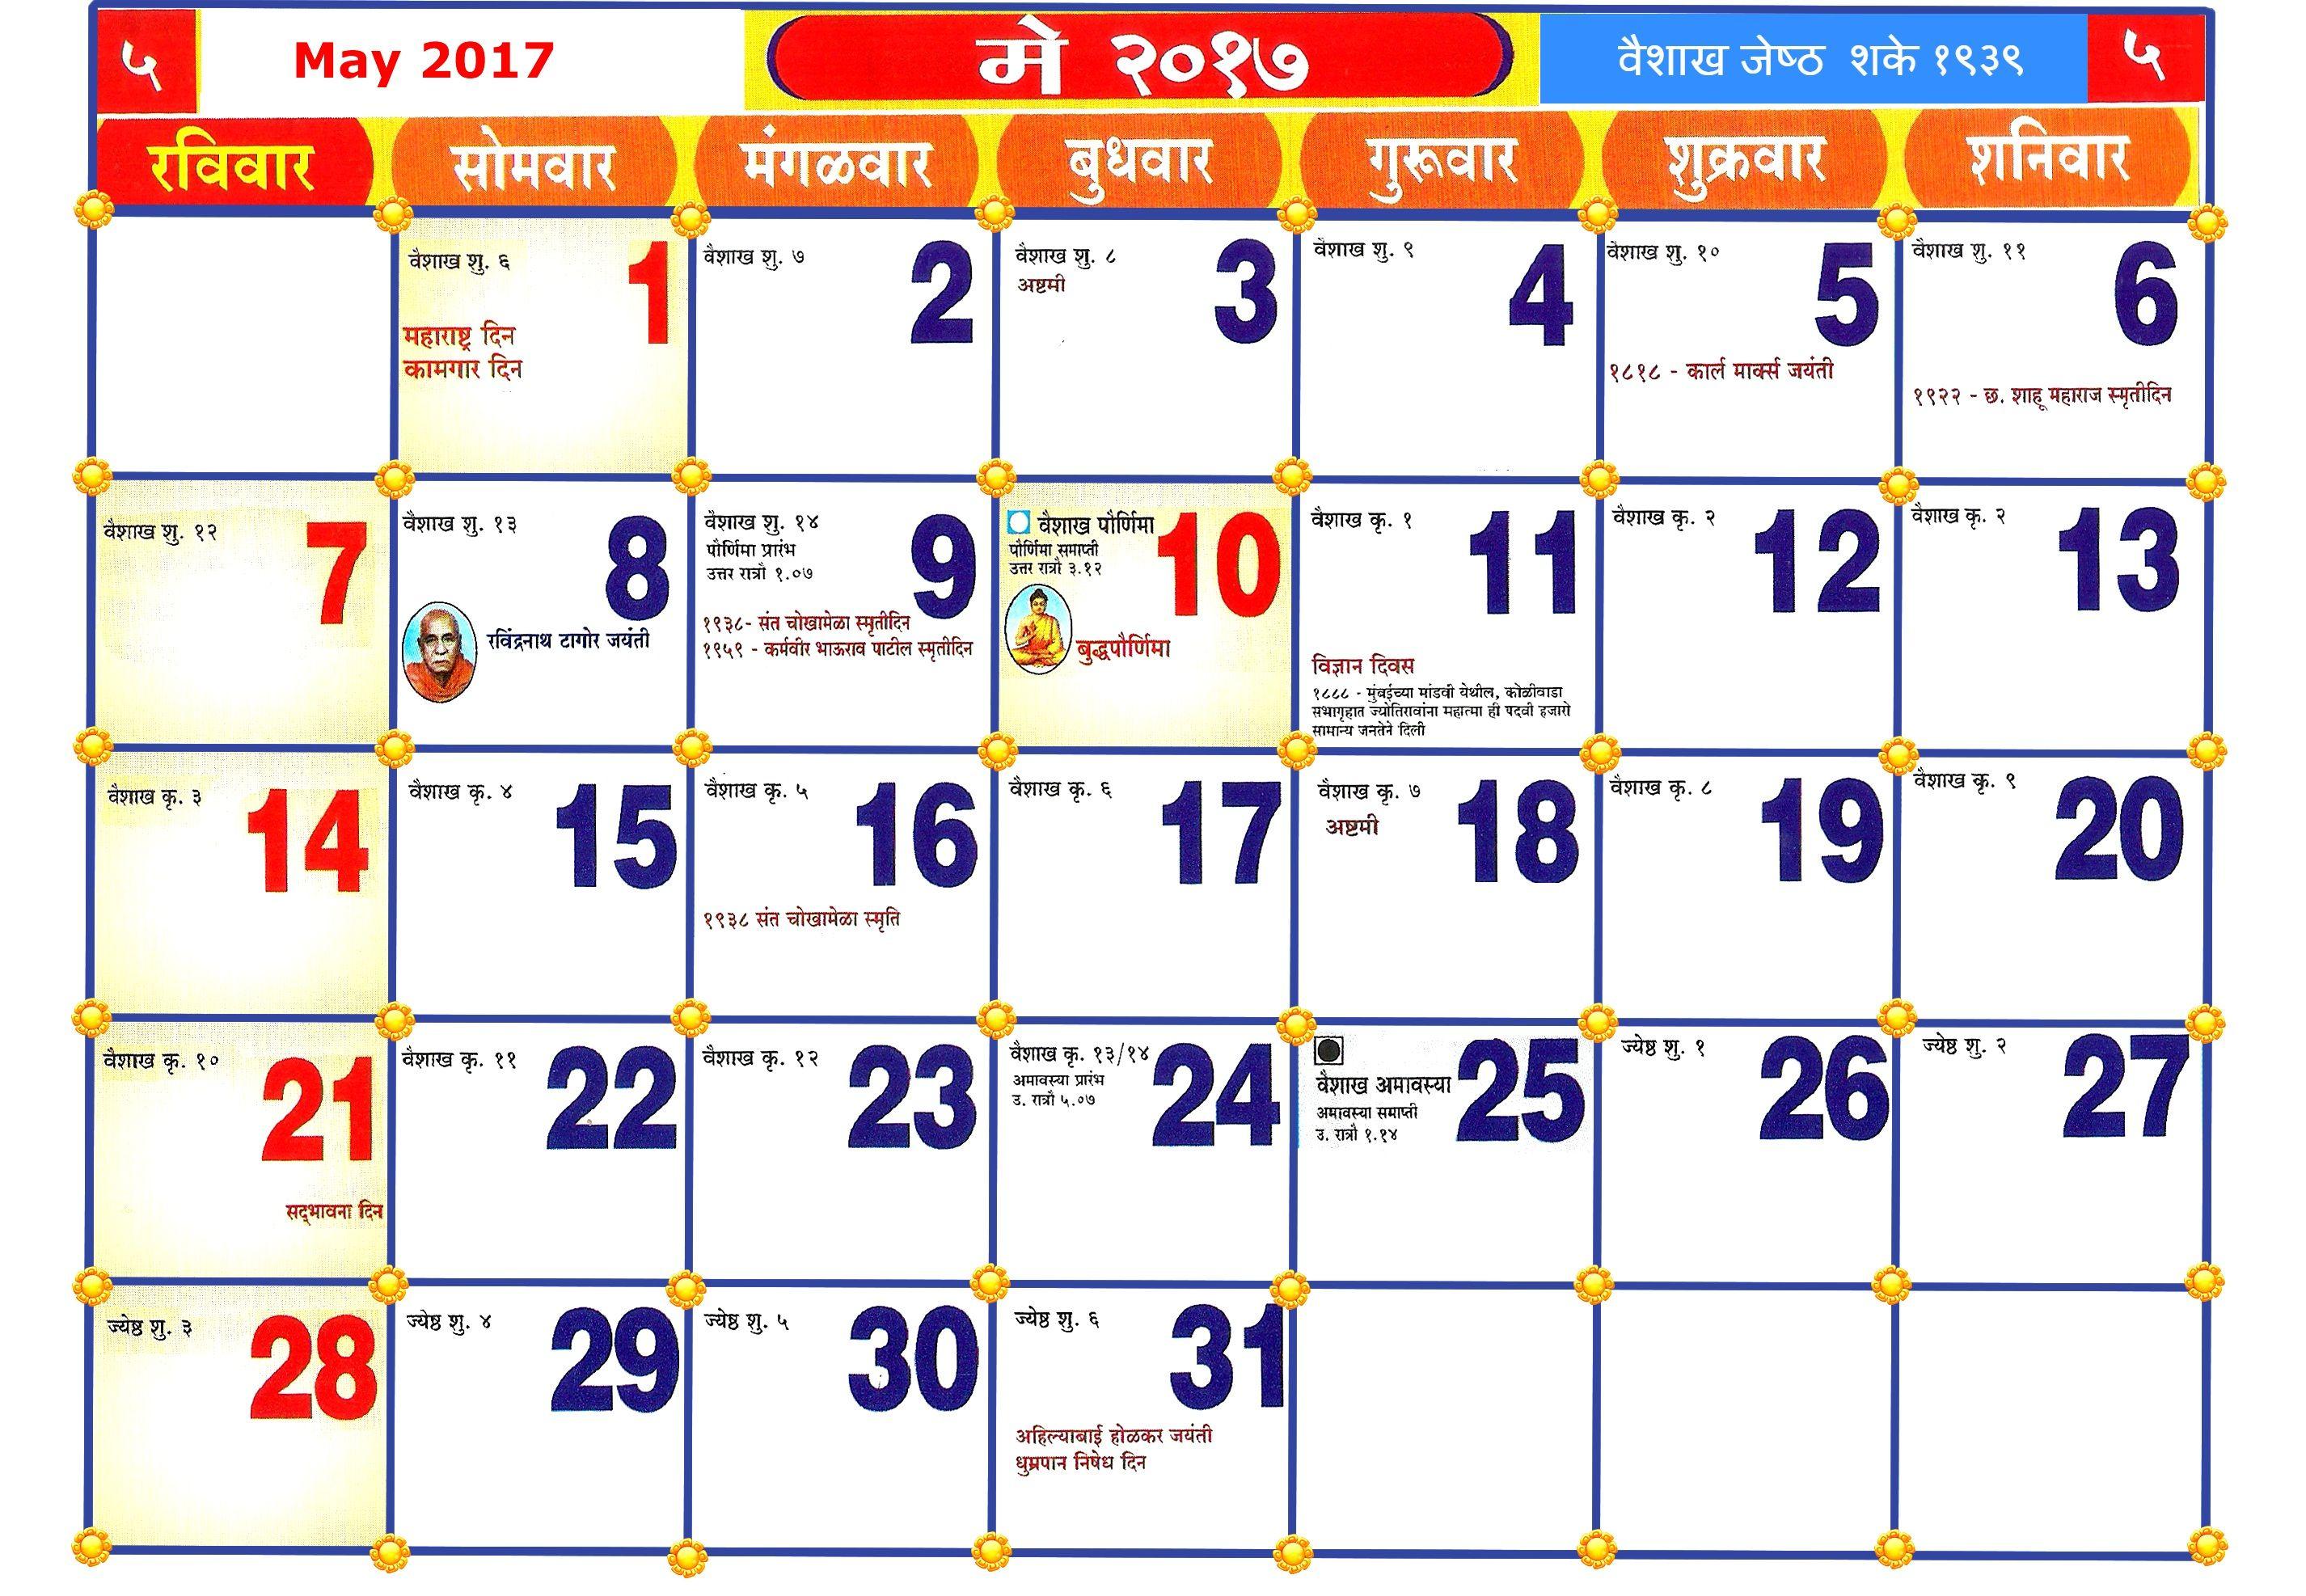 Calendar Girl May Free Pdf : May marathi calendar pdf download as pinterest